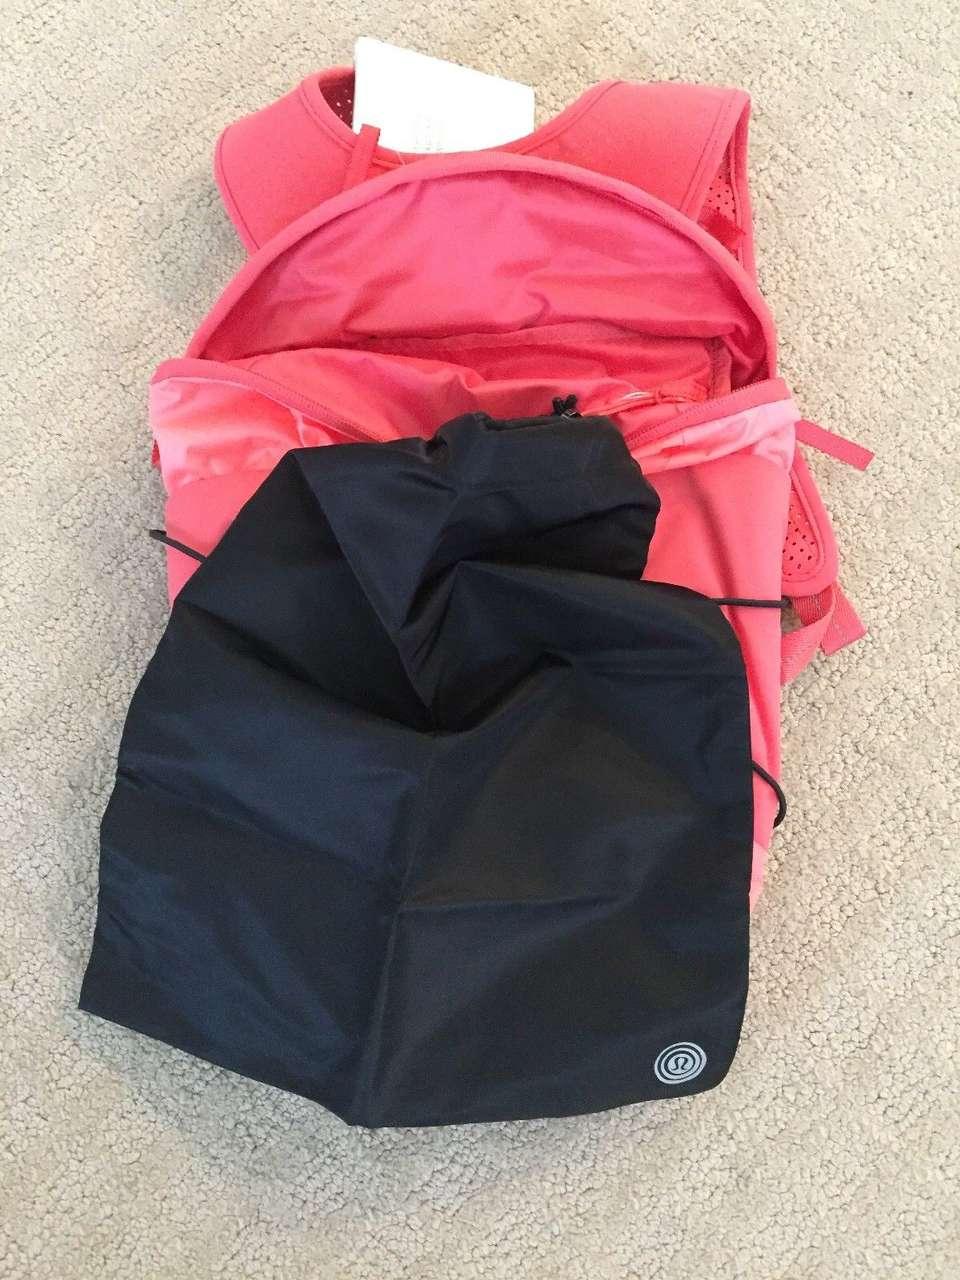 Lululemon Run All Day Backpack II *SW - 2017 Seawheeze - GRAL